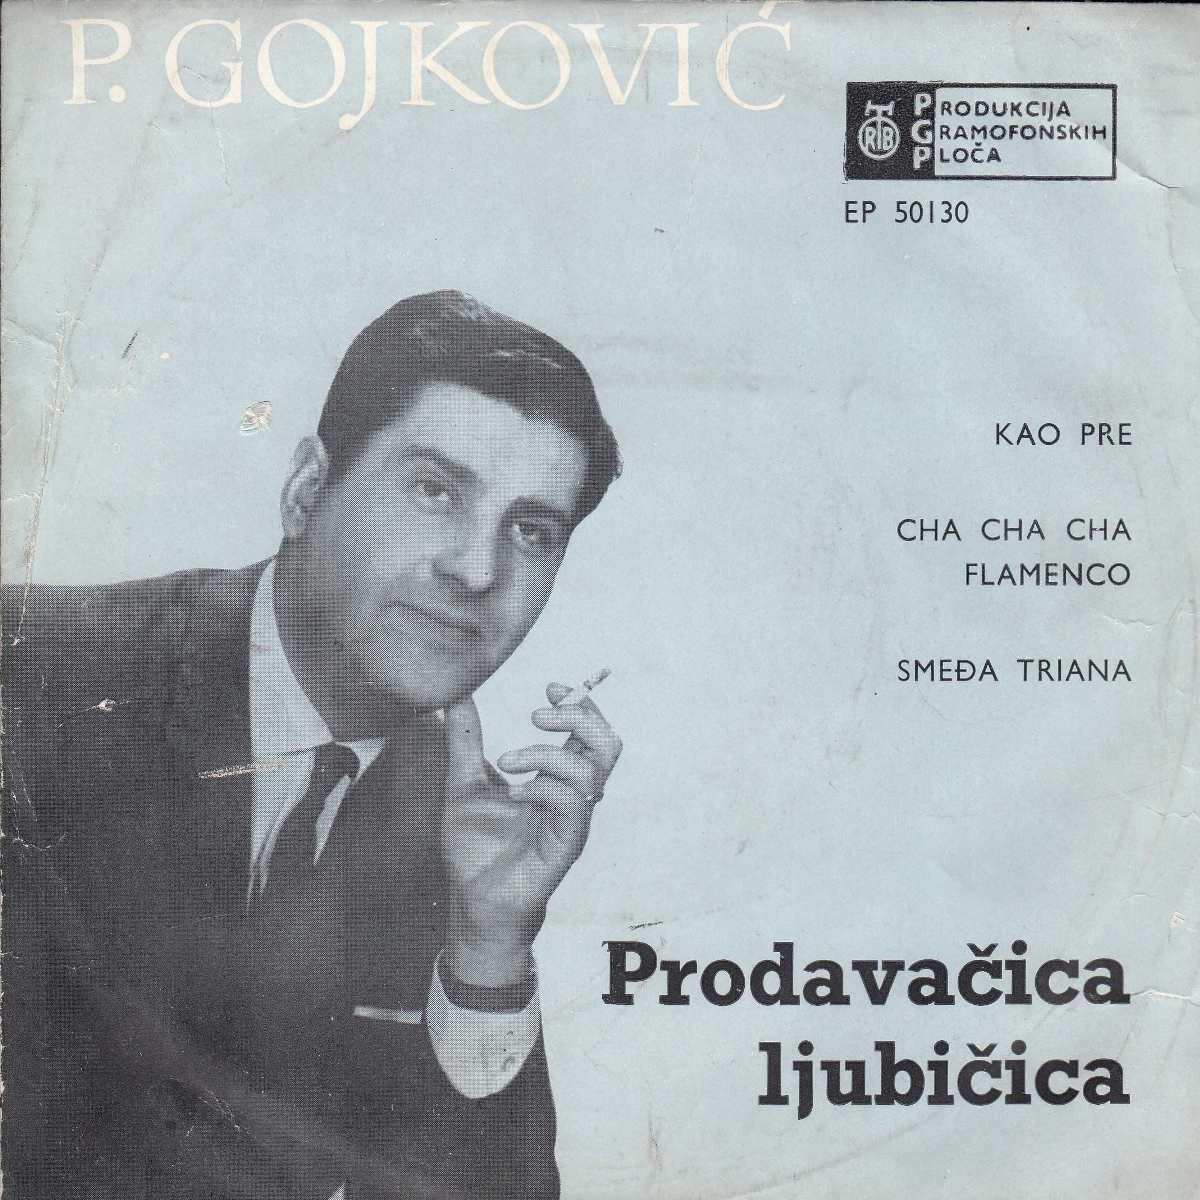 Gojkovic Predrag Cune - Cha Cha Cha Flamenco/smedja Triana/prodavacica Ljubicica/kao Pre